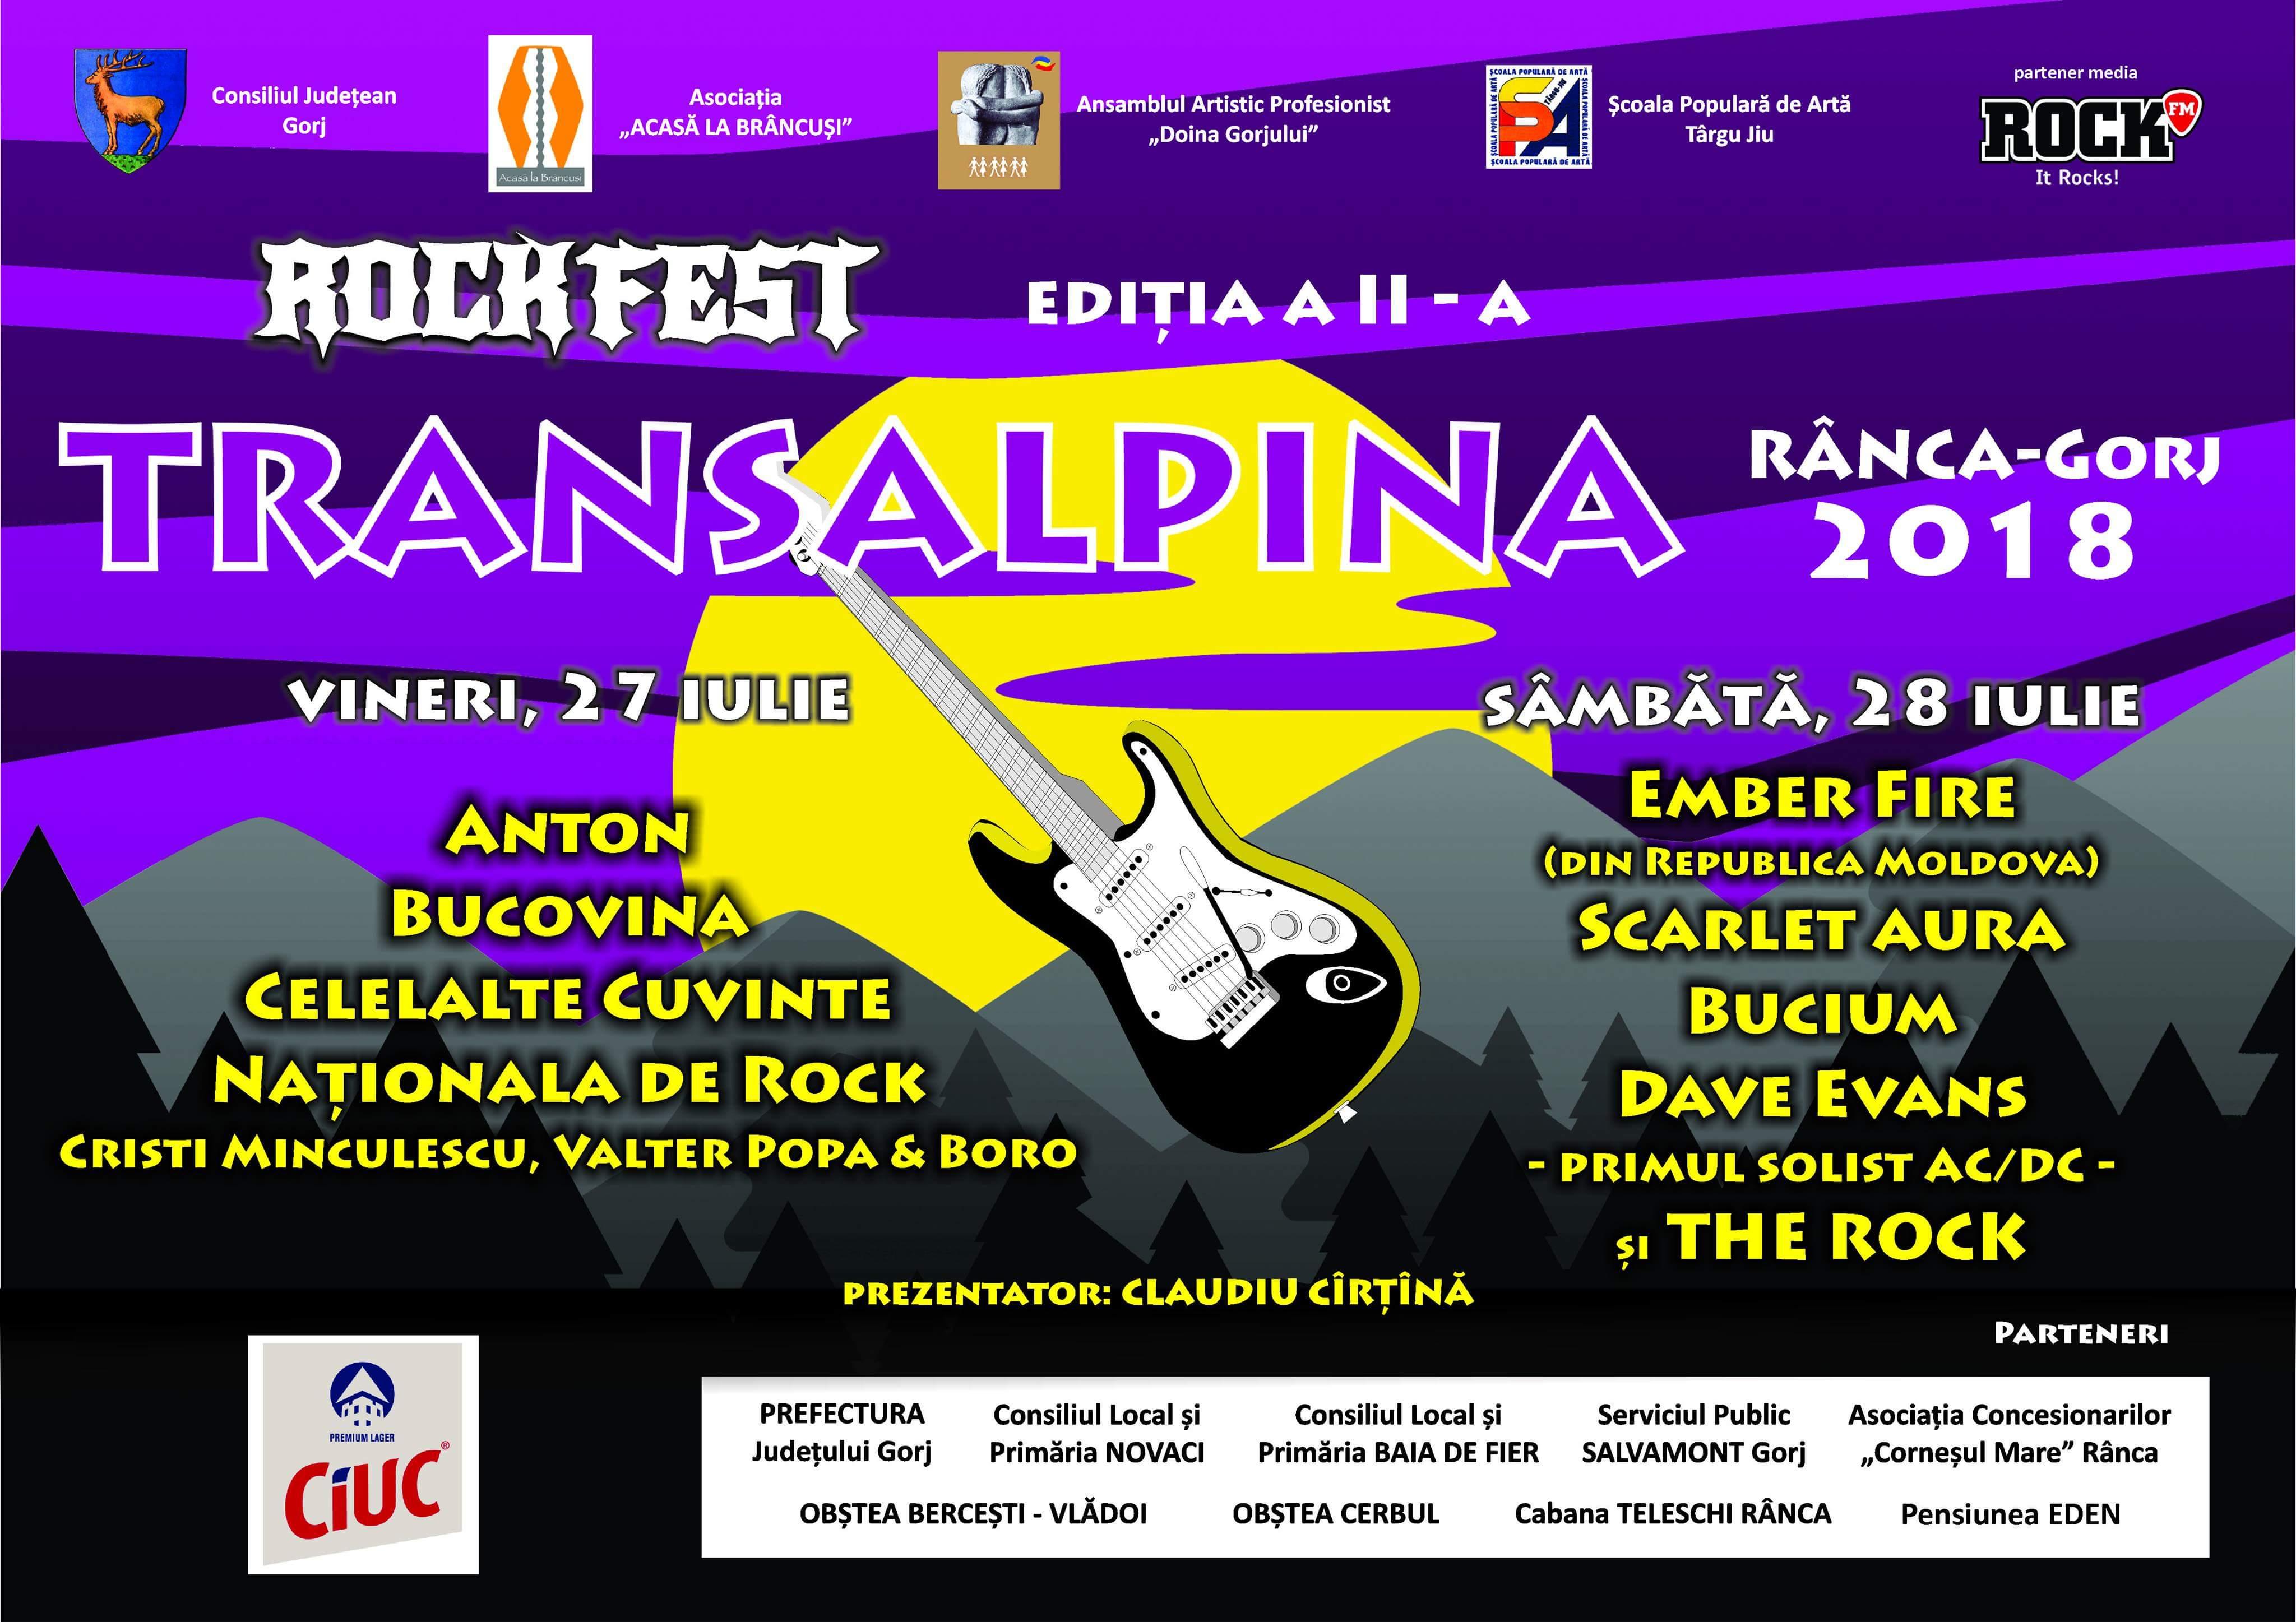 rockfest editia a 2 a 2018